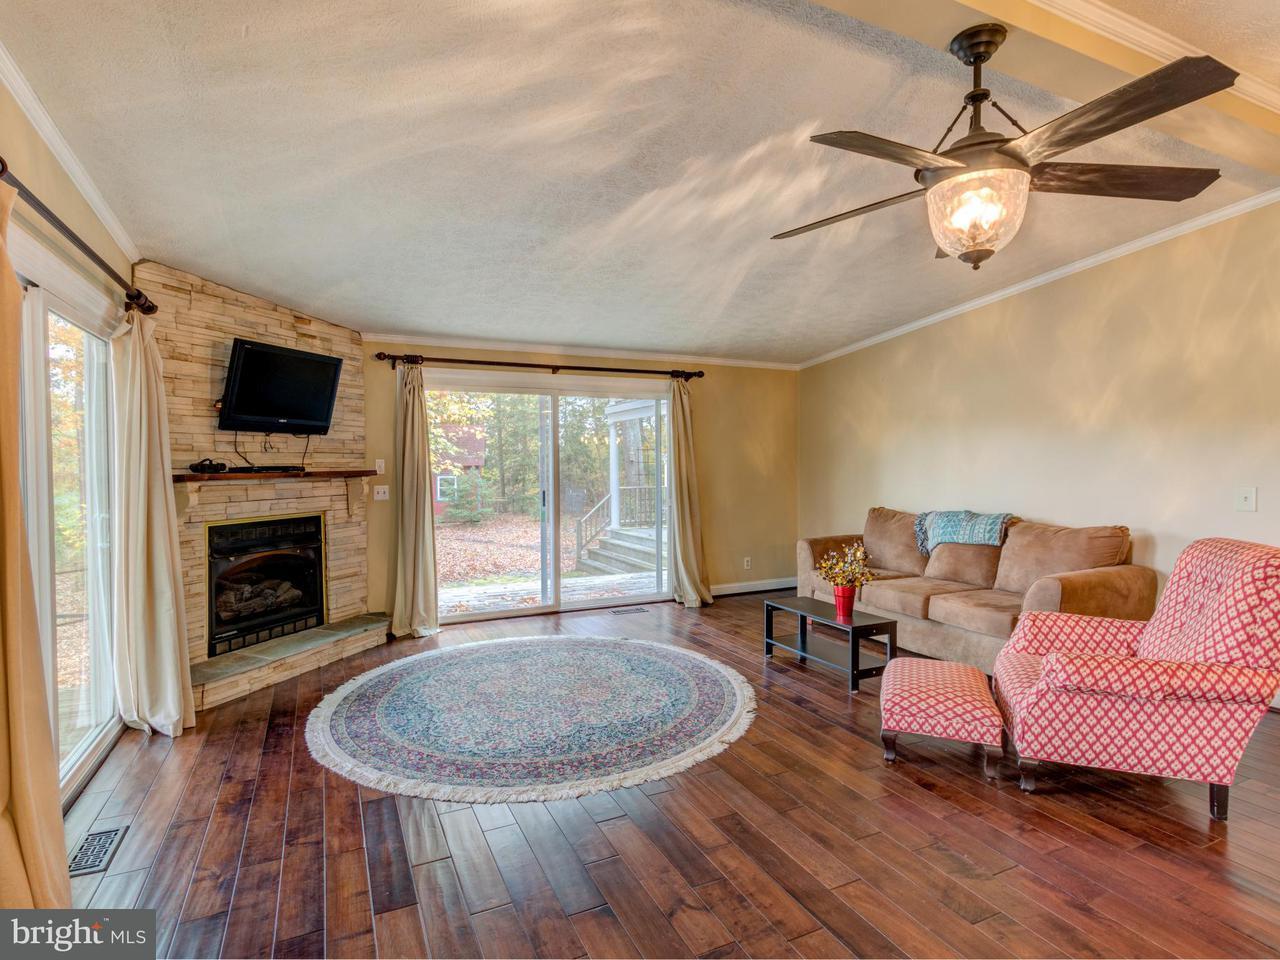 Additional photo for property listing at 951 BONUM POINT Lane 951 BONUM POINT Lane Kinsale, Virginia 22488 Vereinigte Staaten